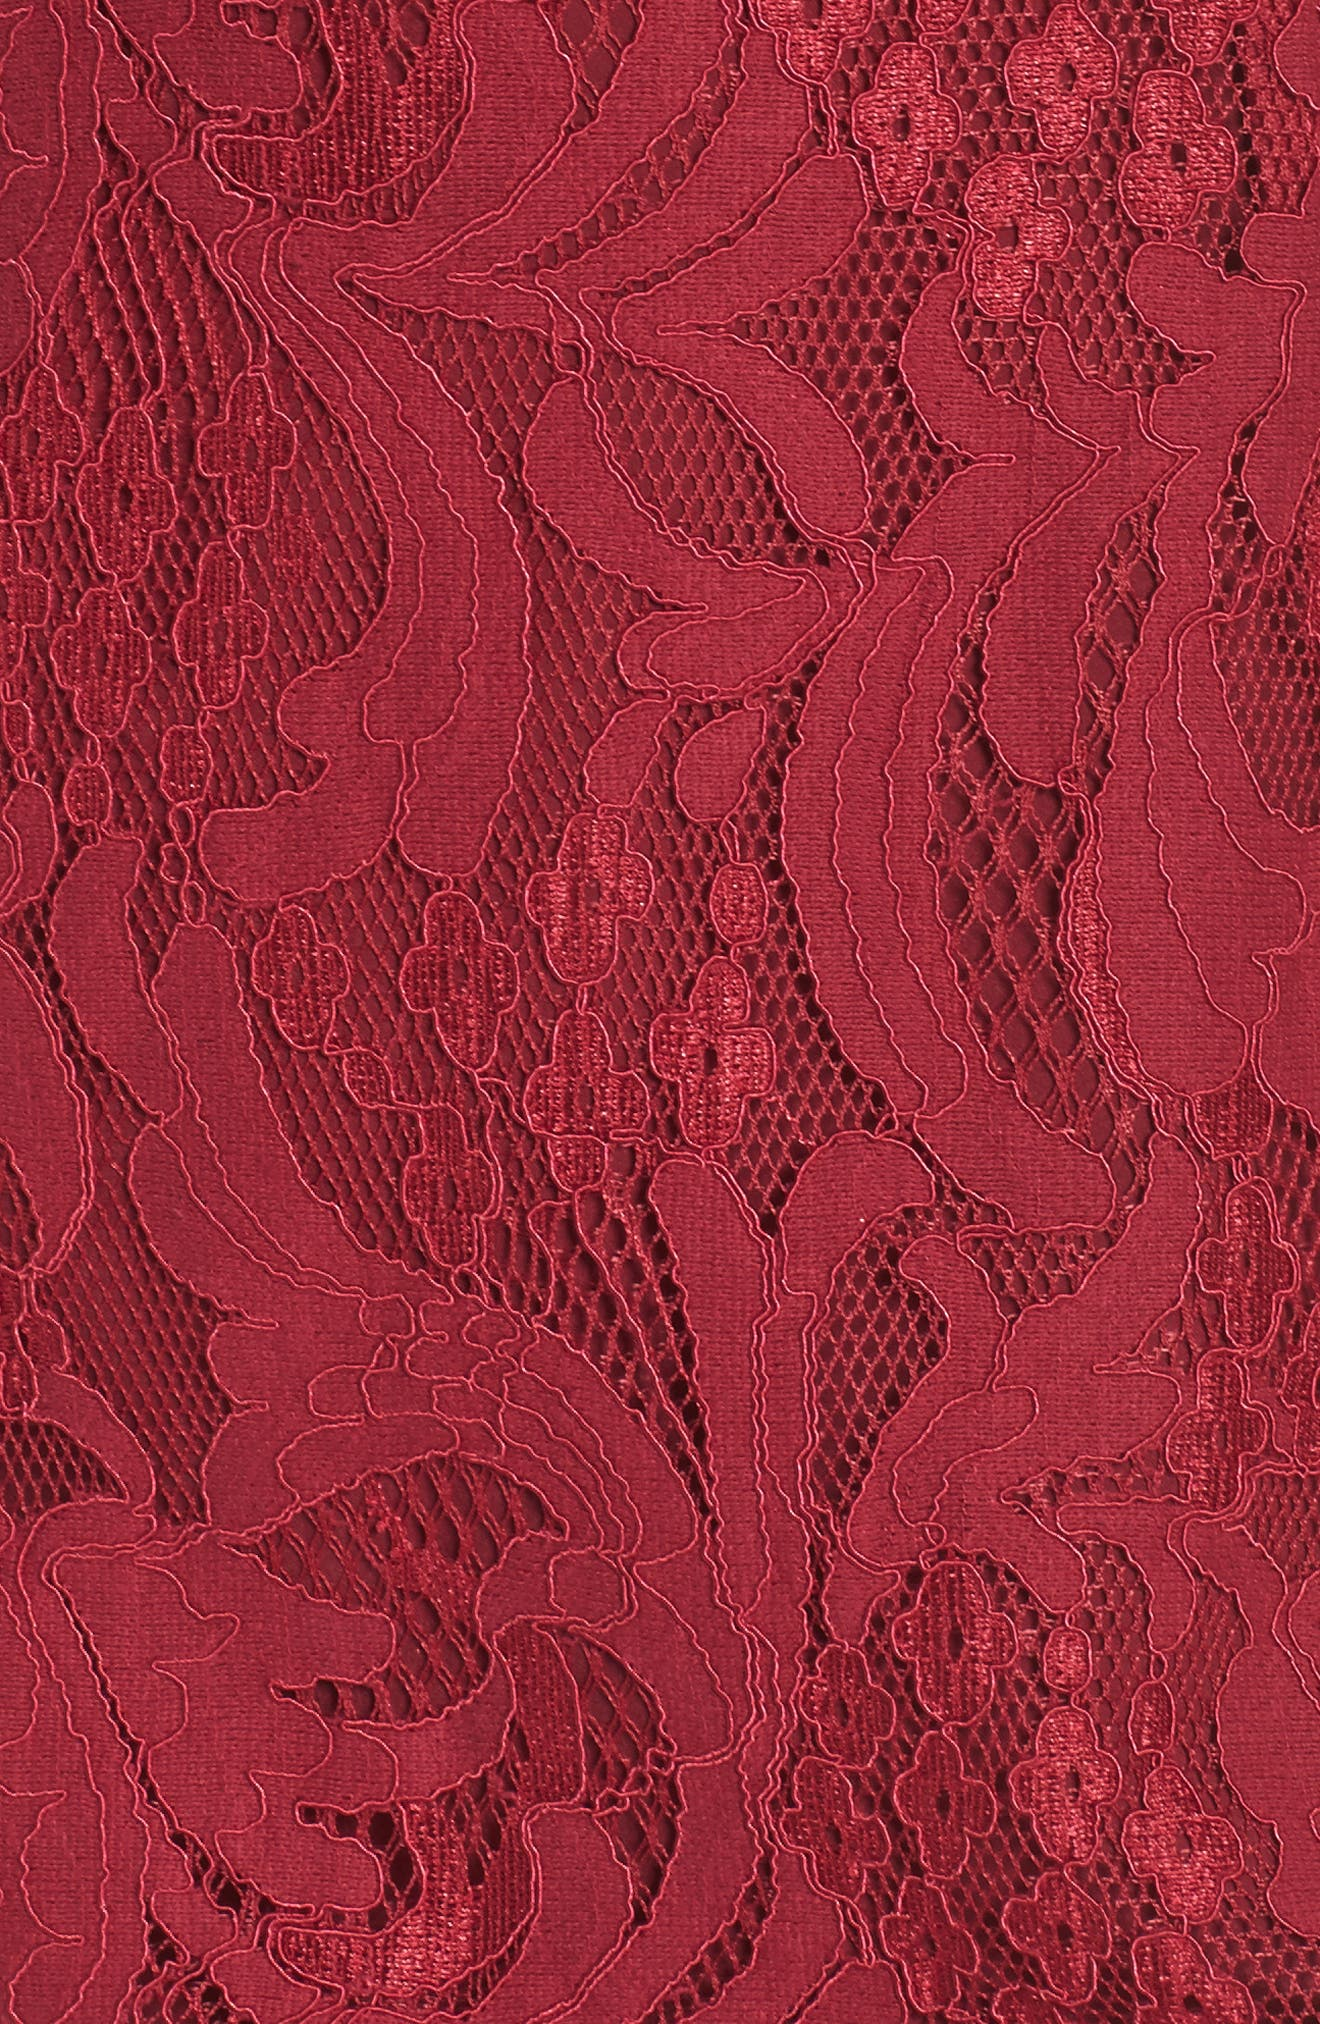 Delilah Lace Sheath Dress,                             Alternate thumbnail 10, color,